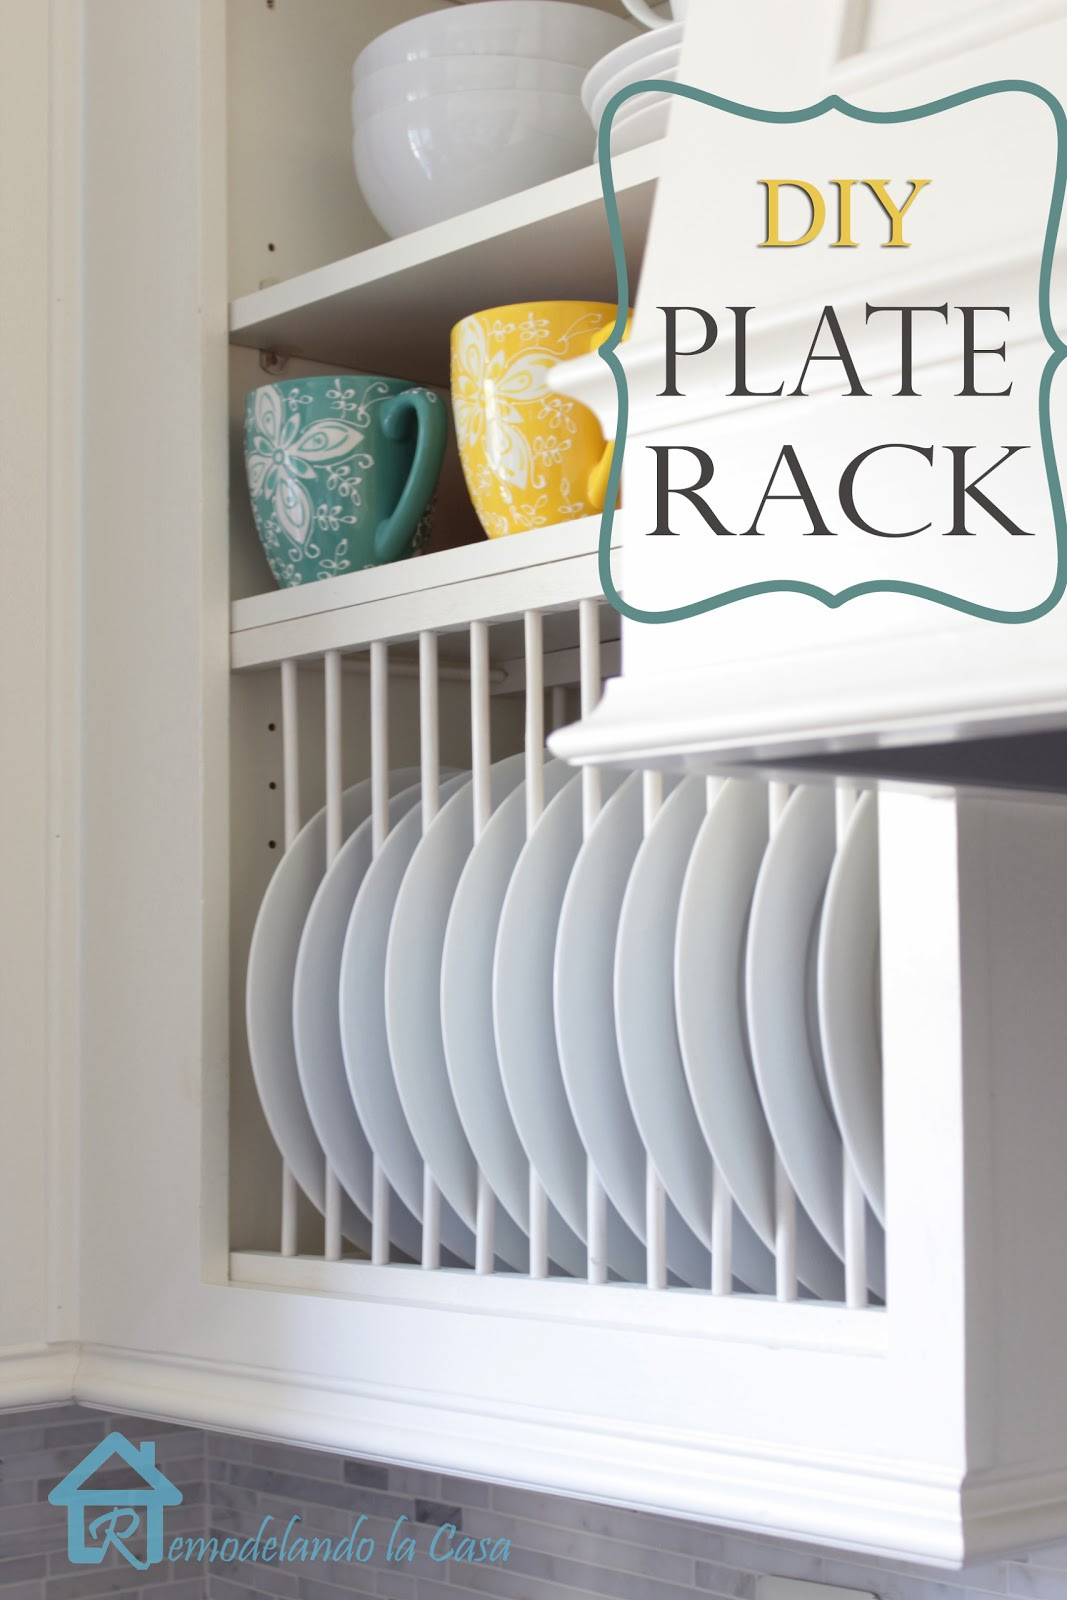 DIY Plate Rack  DIY Inside Cabinet Plate Rack Remodelando la Casa